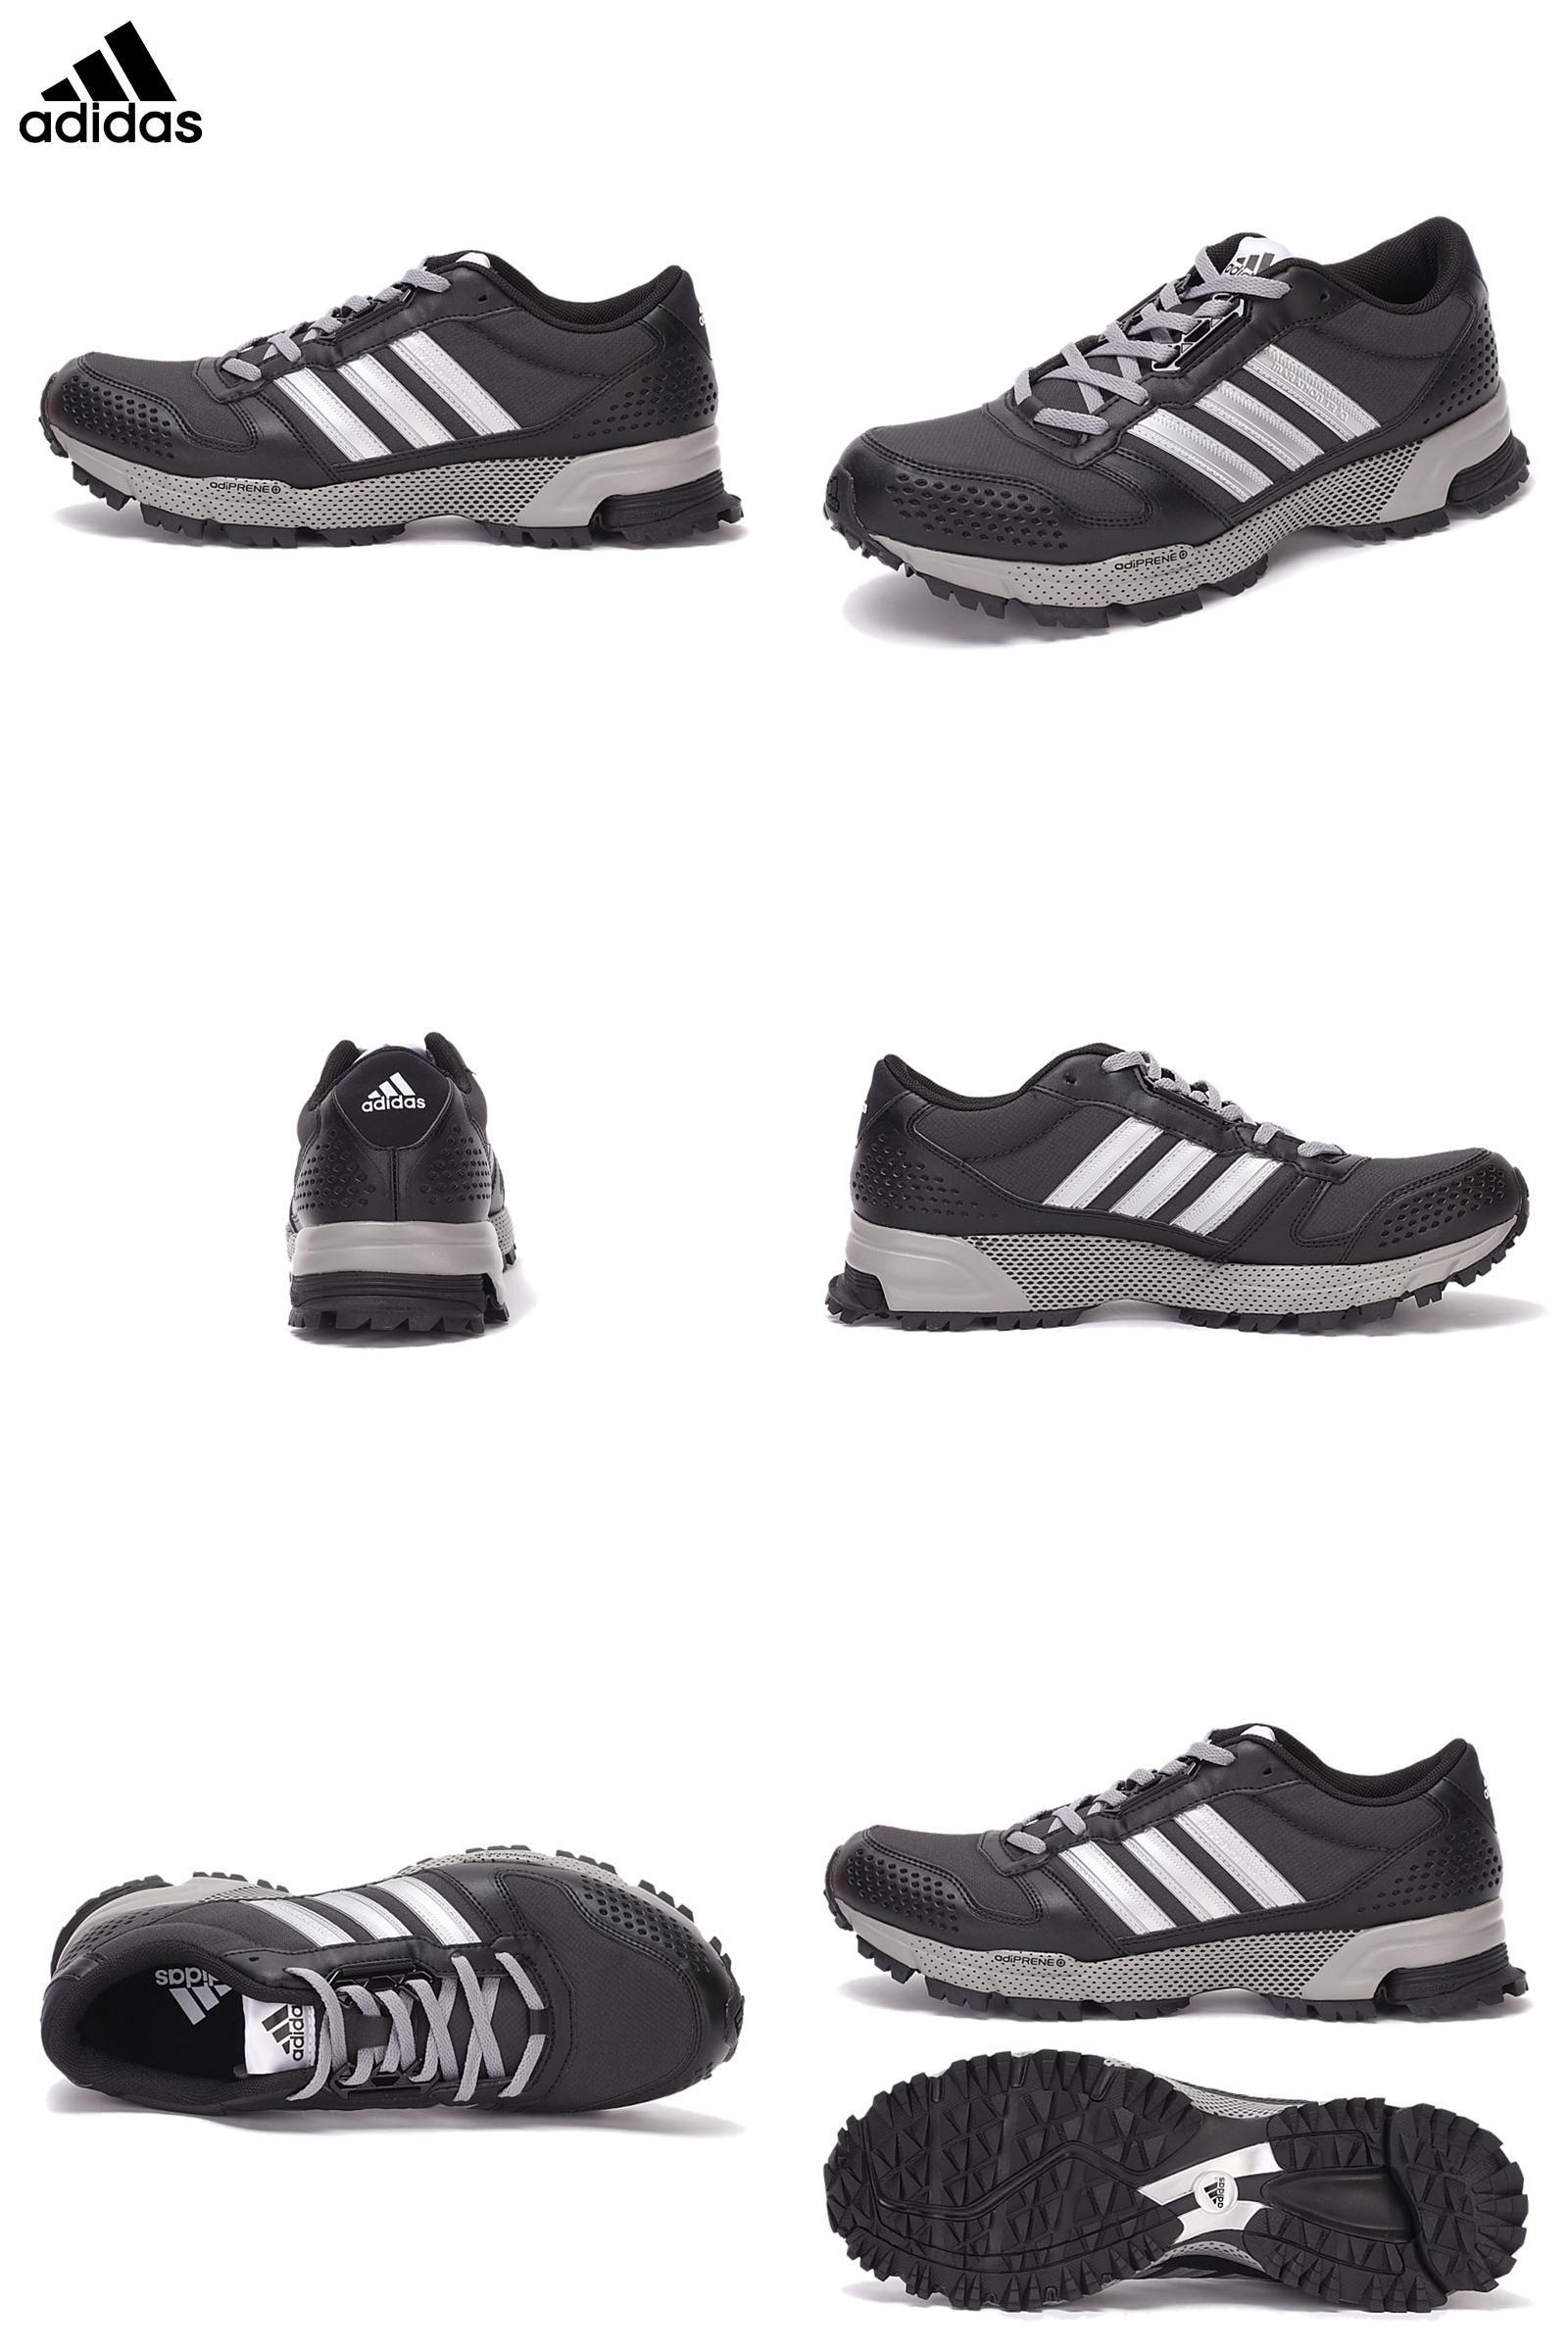 df85b93eb1b  Visit to Buy  Original New Arrival 2017 Adidas Marathon 10 Tr M Men s  Running